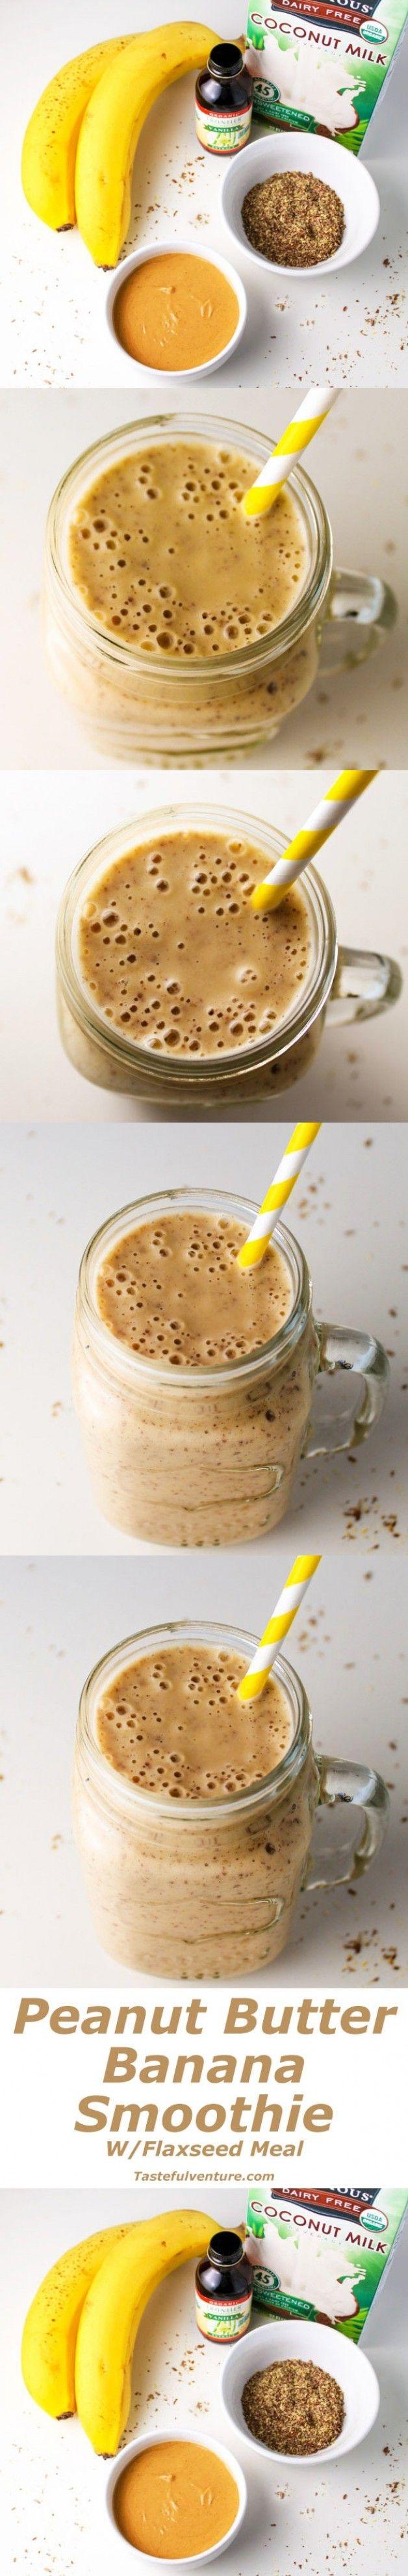 Peanut Butter Banana Smoothie (with Flaxseed Meal - Tastefulventure #flaxseedmealrecipes